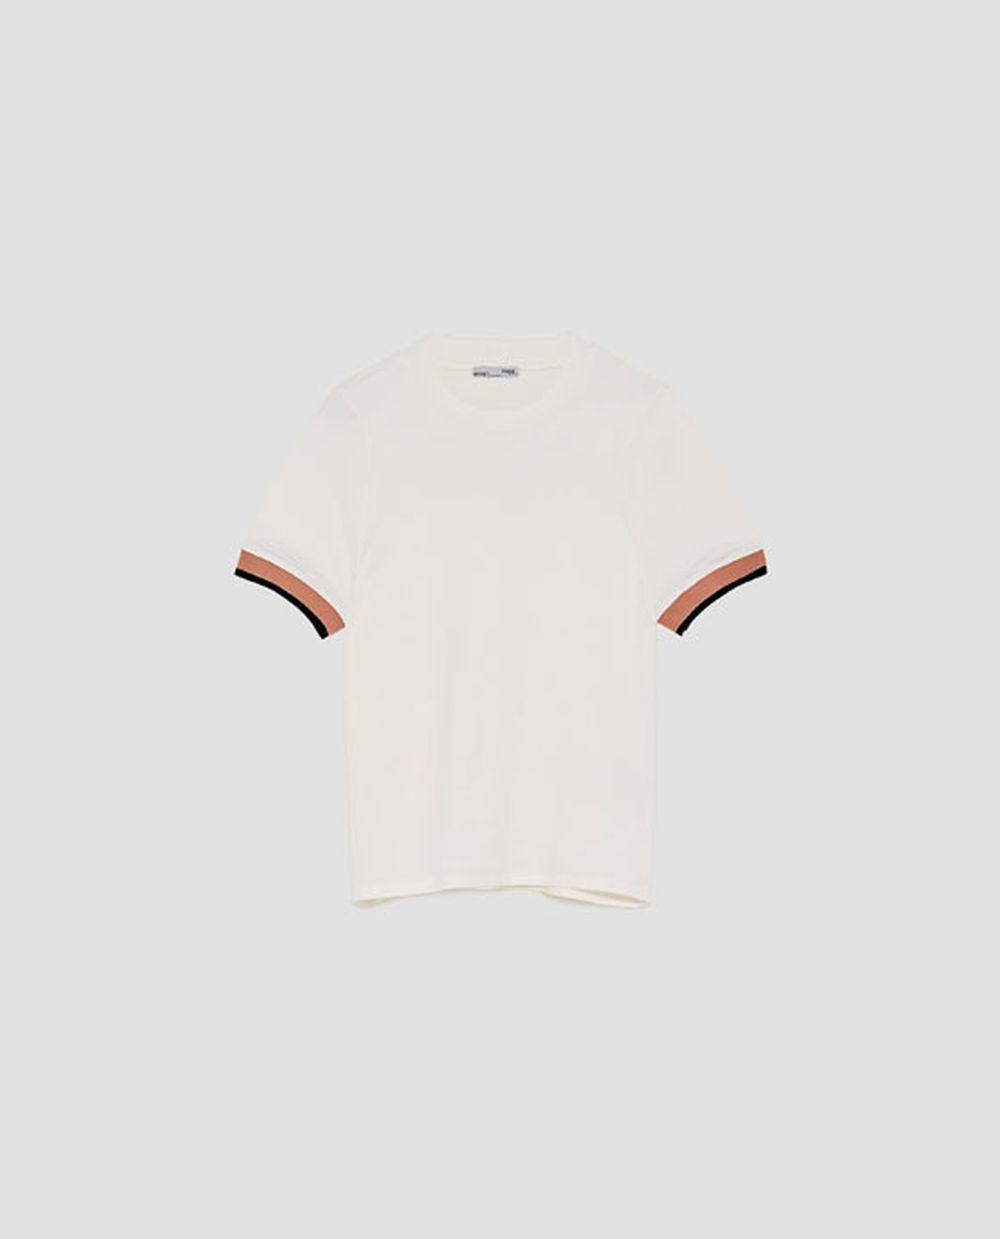 Camiseta blanca con ribete (12,95 euros).